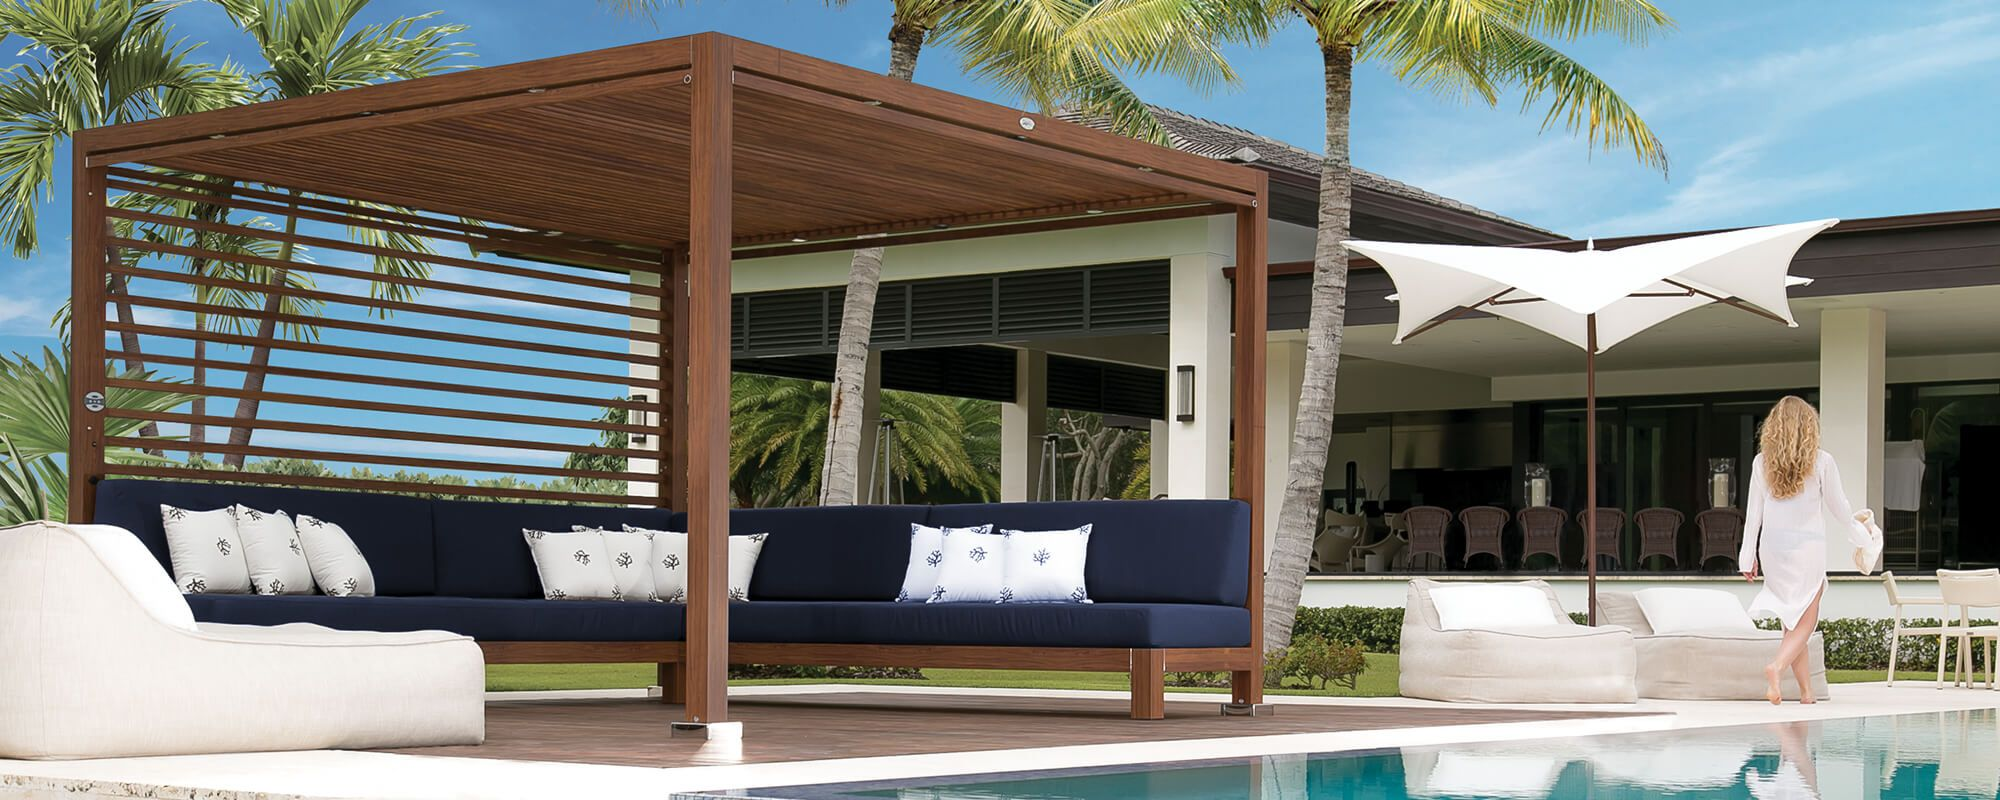 Pin by Cynthia Forchielli on Hilton Ocala   Pinterest   Cabana ...